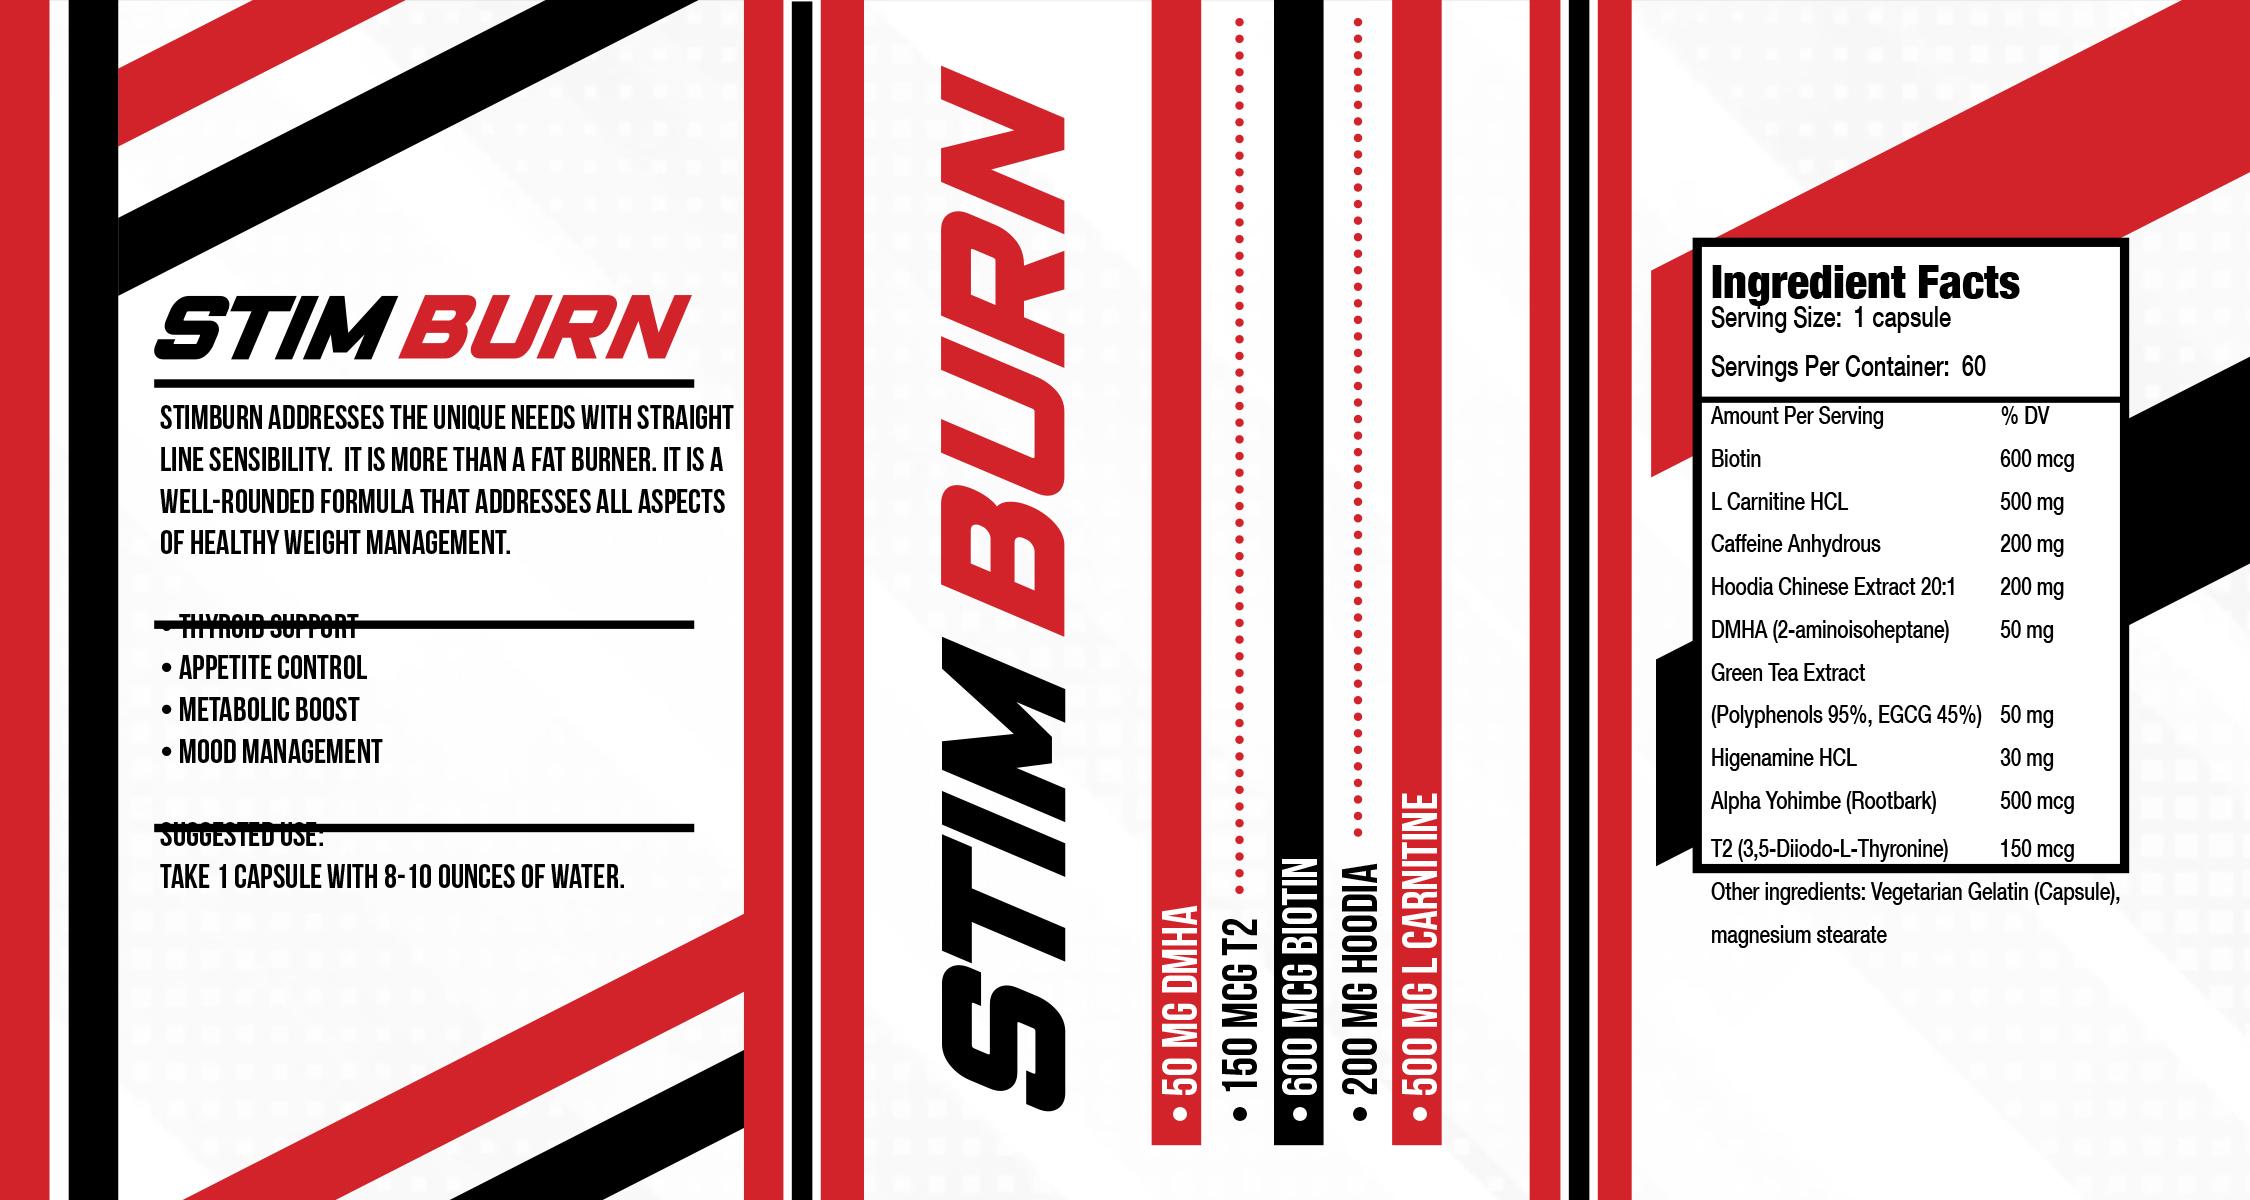 stimburn-label.jpg